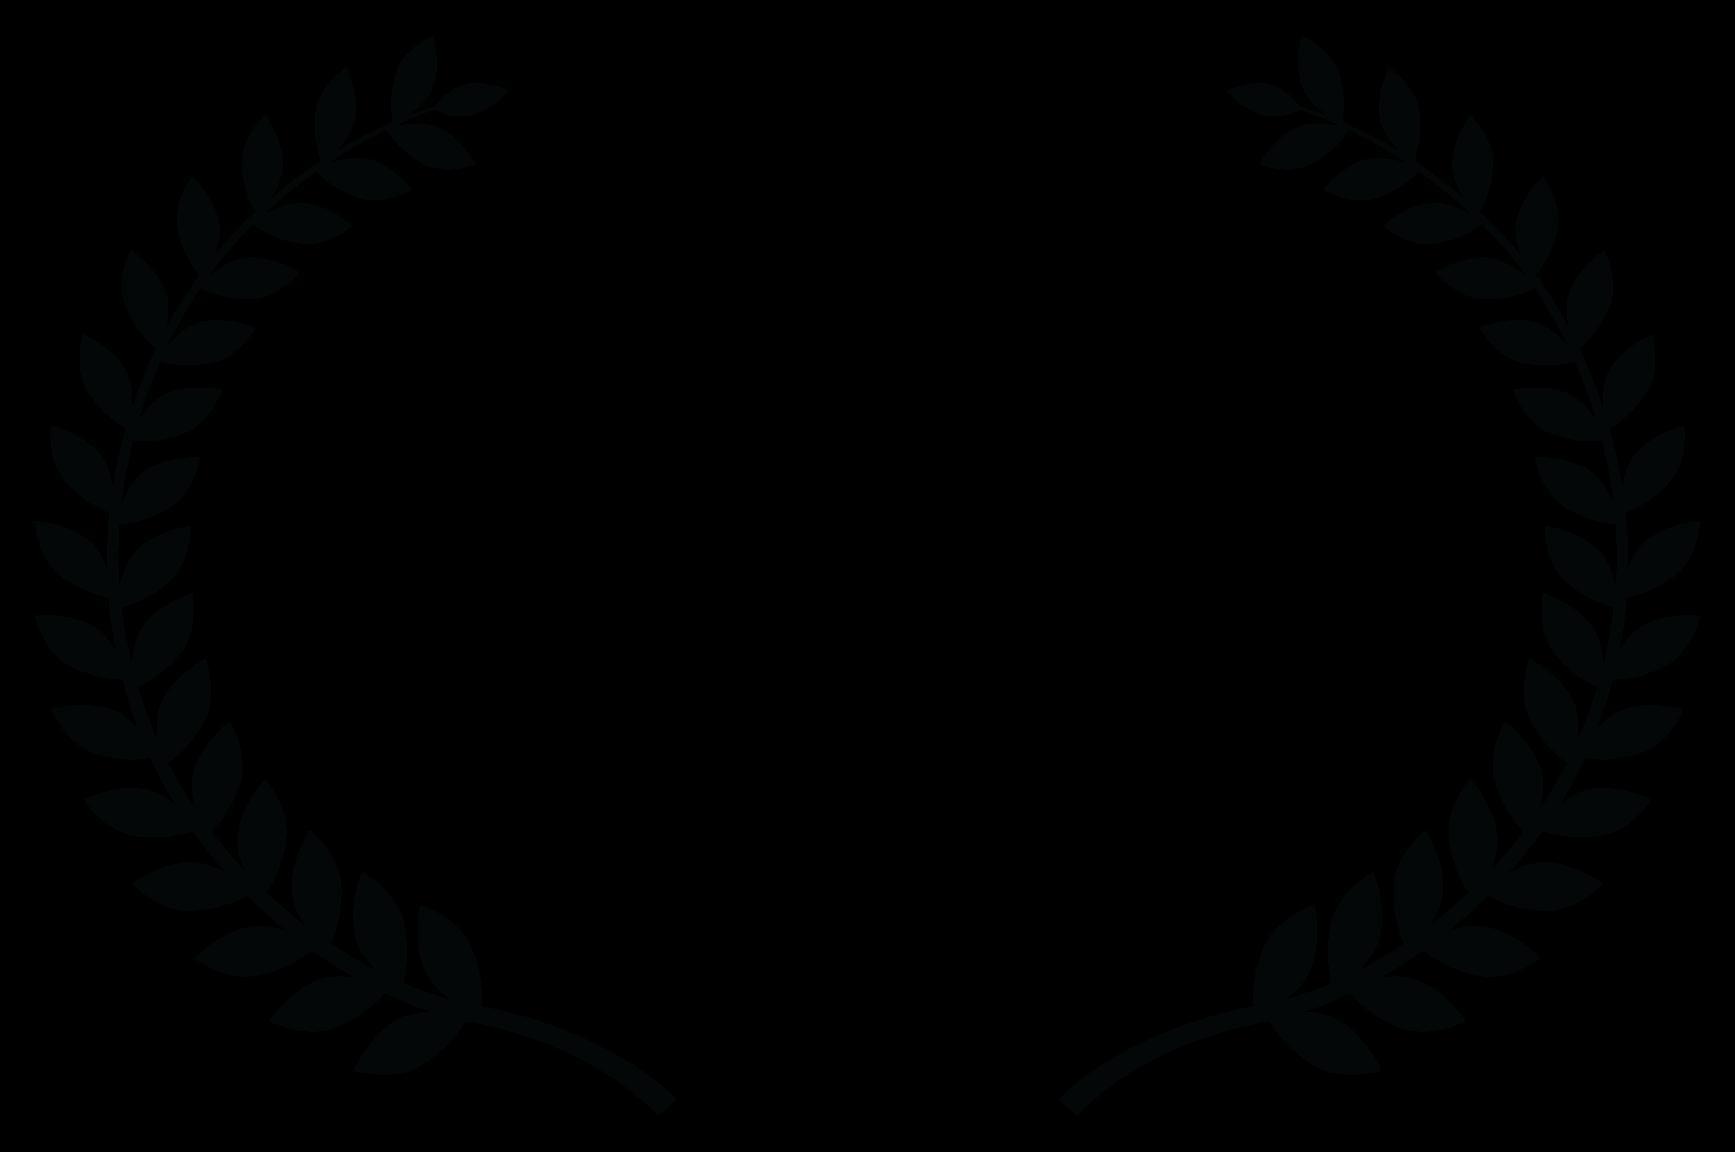 OFFICIAL SELECTION Dandelions - RICHMOND INTERNATIONAL FILM FESTIVAL - 2019.png